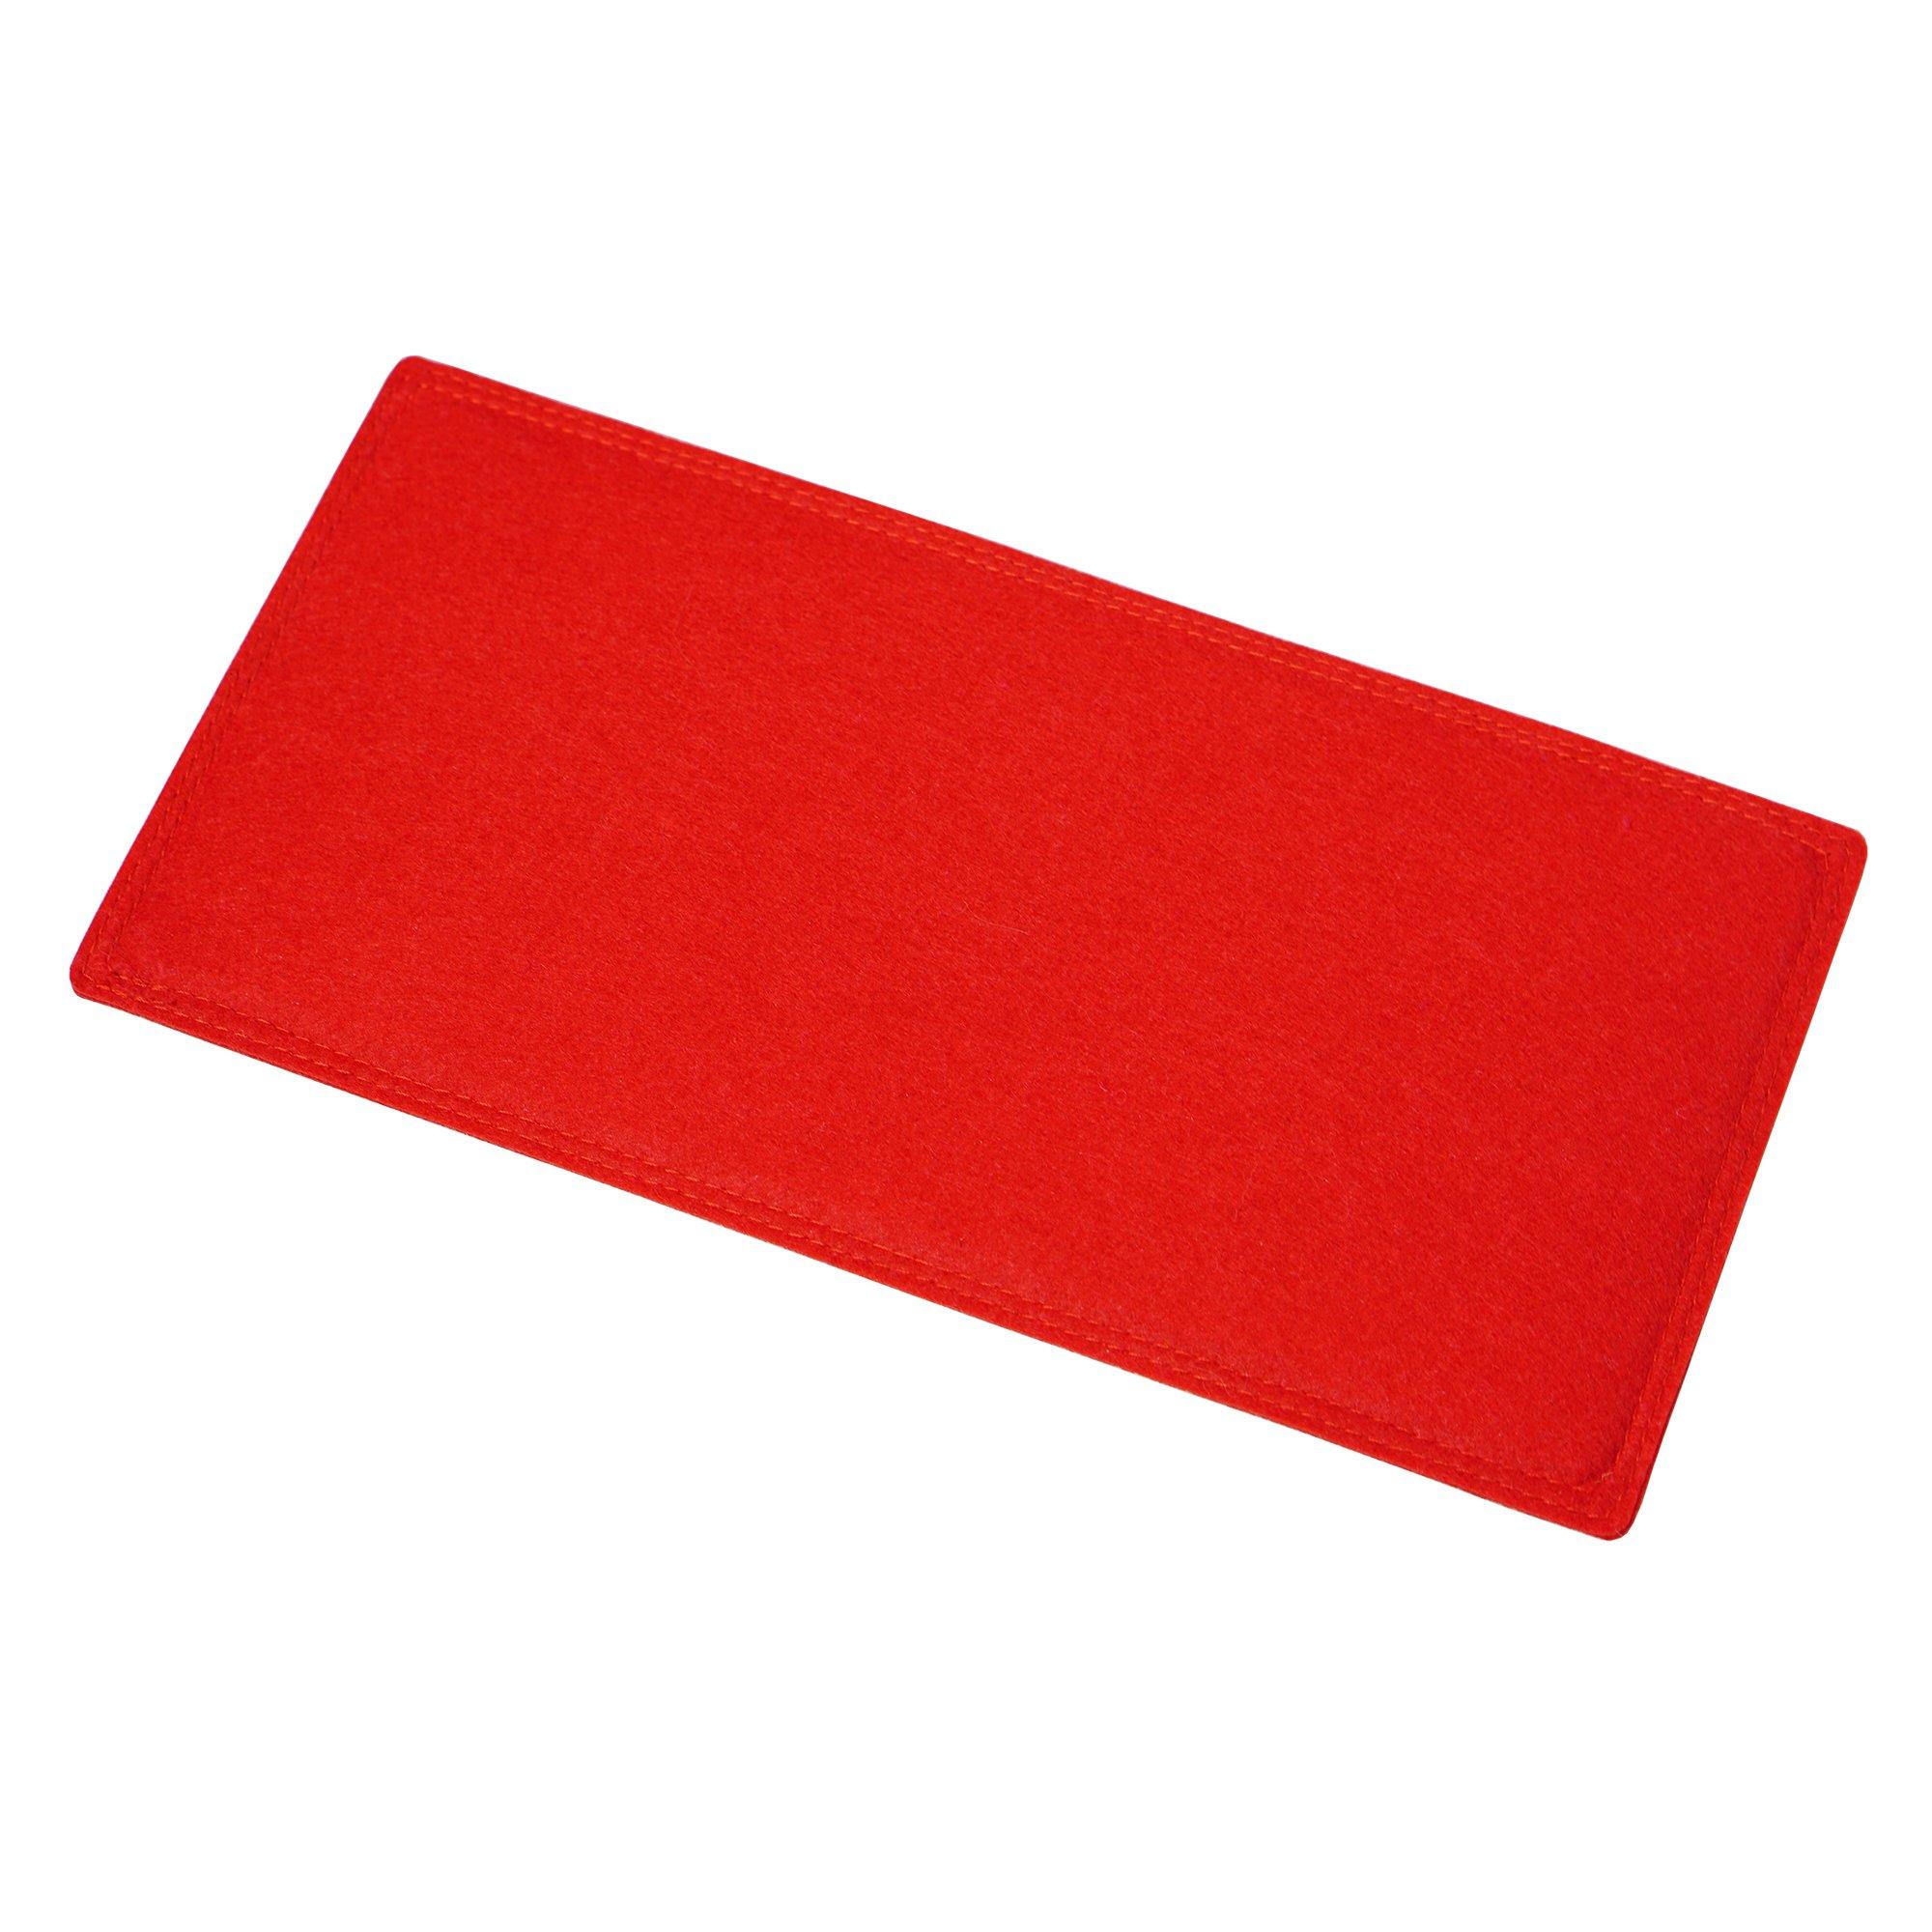 Red Felt Bag Base Shaper for LV Speedy 30 by Belle Bag Designs